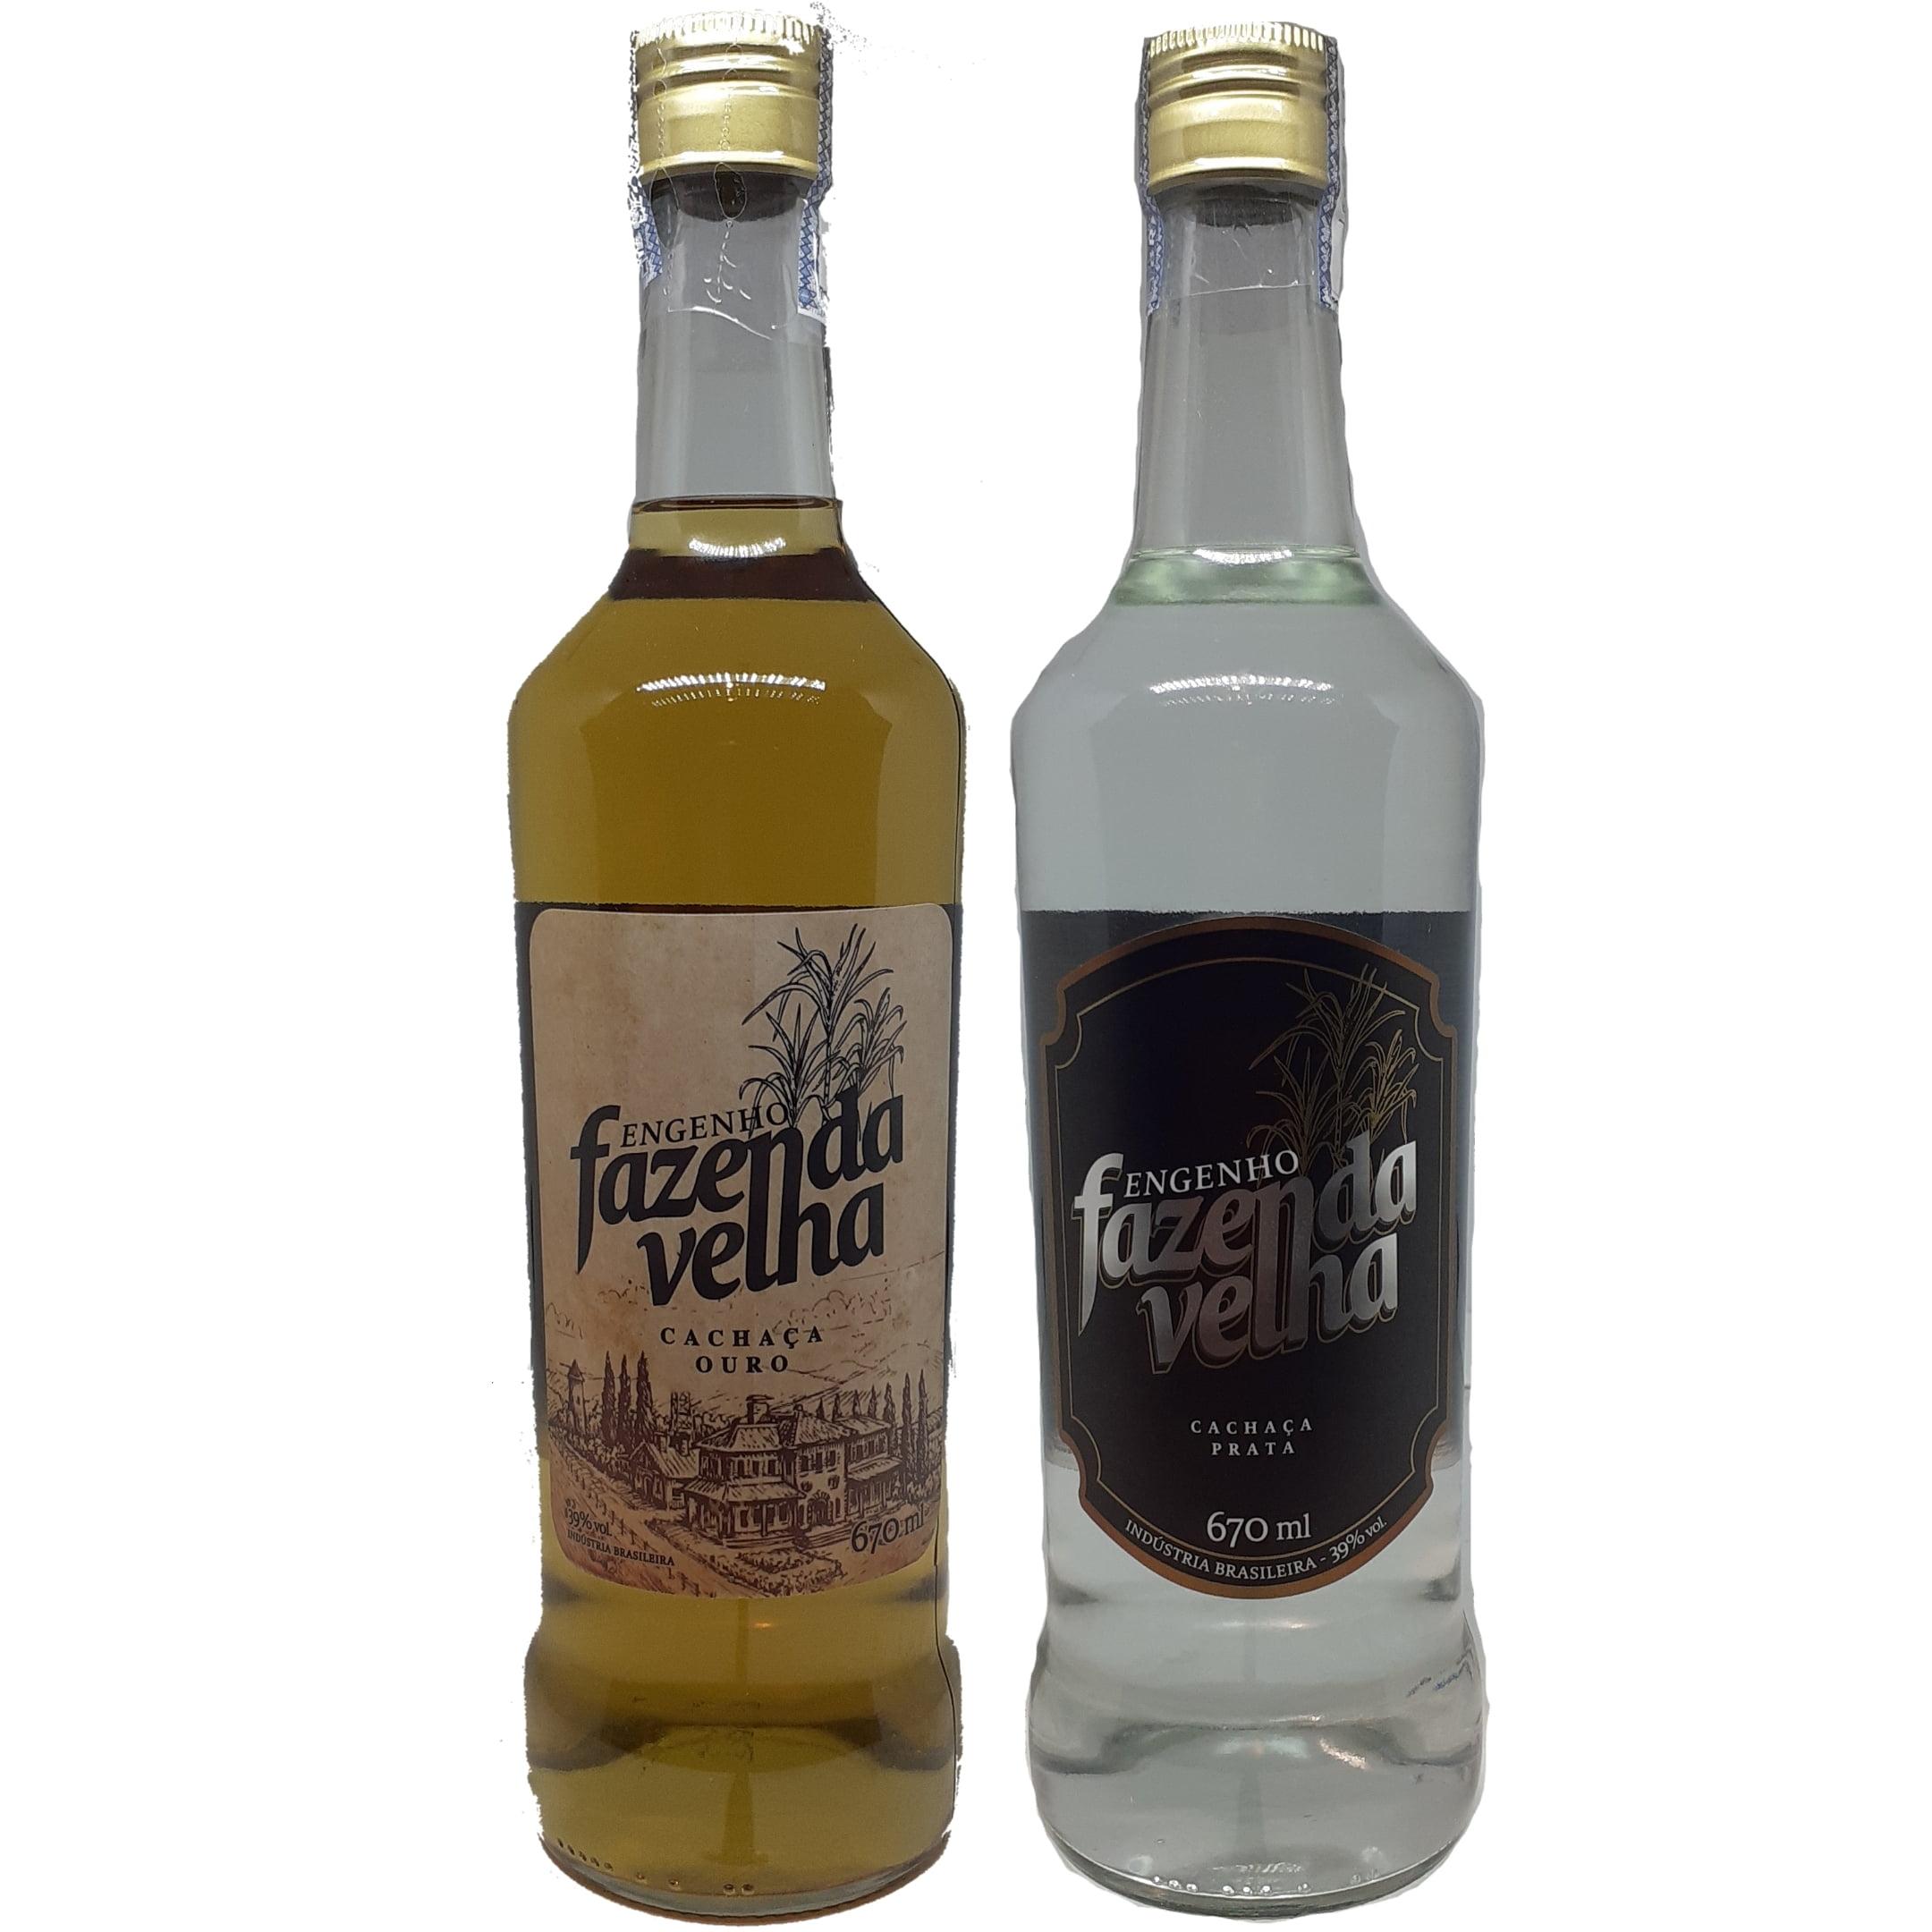 Kit Cachaça Engenho Fazenda Velha 670 ml cada.